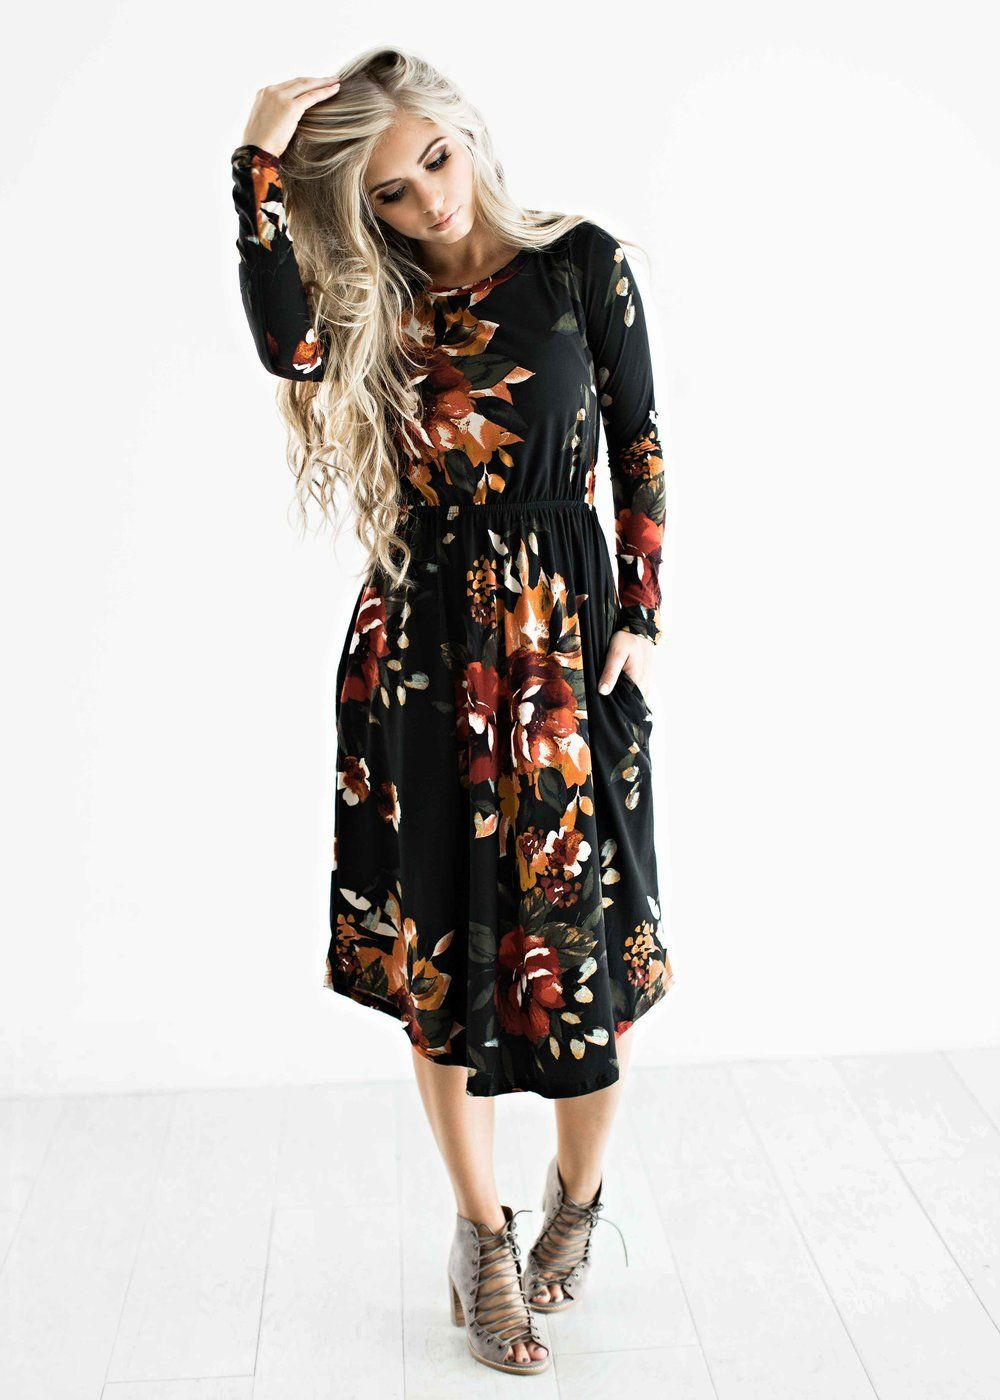 black floral dress, floral, fall floral, style, fashion, fall dresses, womens fashion, blonde hair, wavy hair